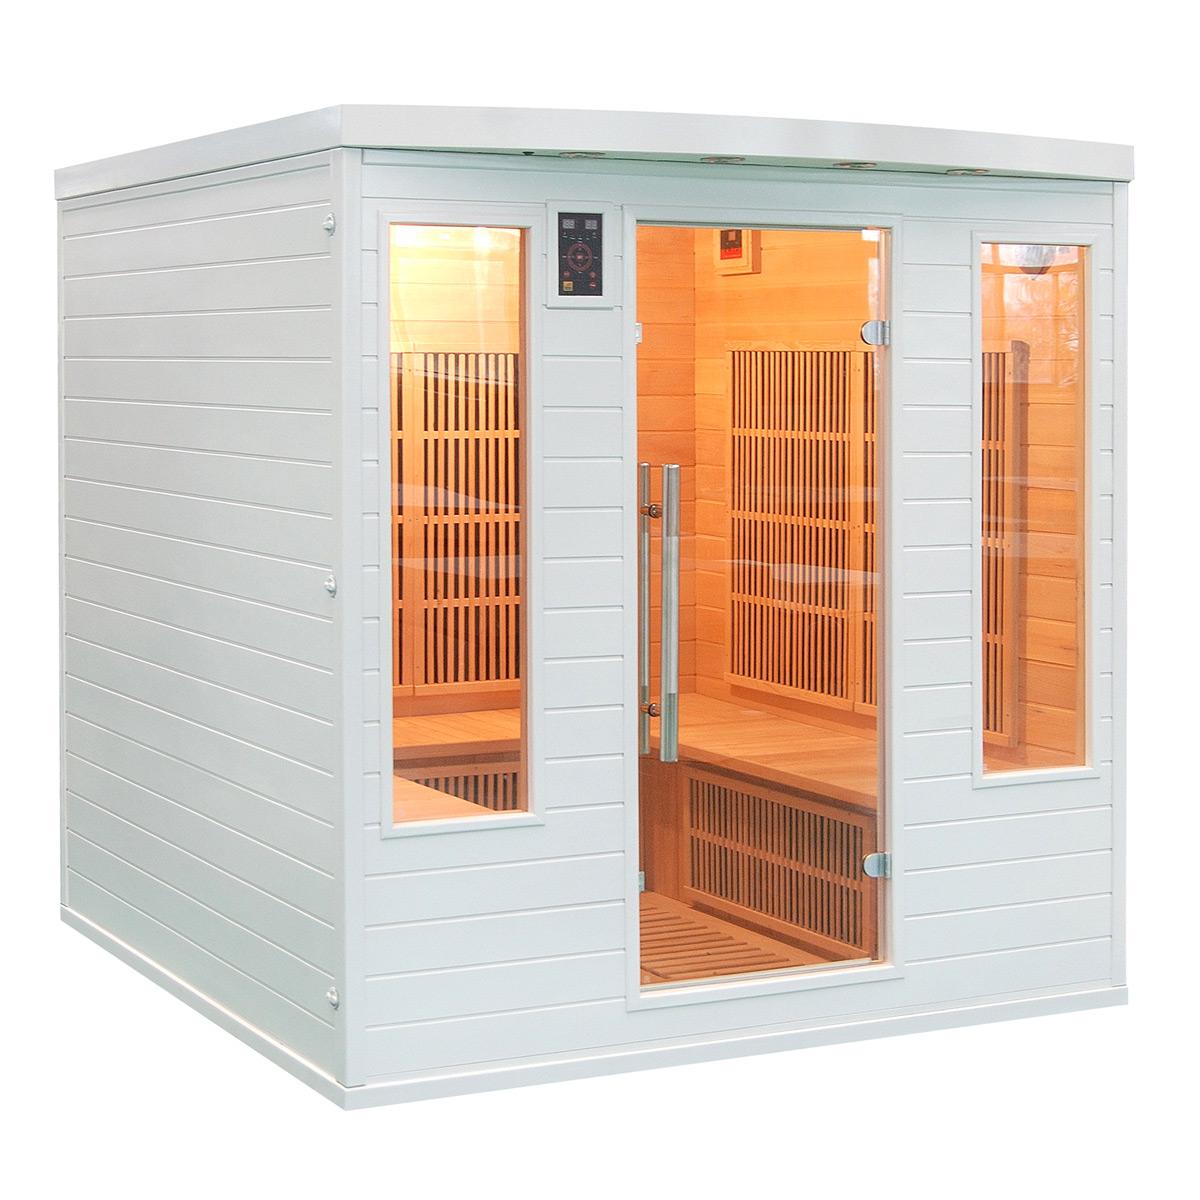 piscinex sauna soleil blanc sauna infrarouge soleil blanc club 4 5 places. Black Bedroom Furniture Sets. Home Design Ideas